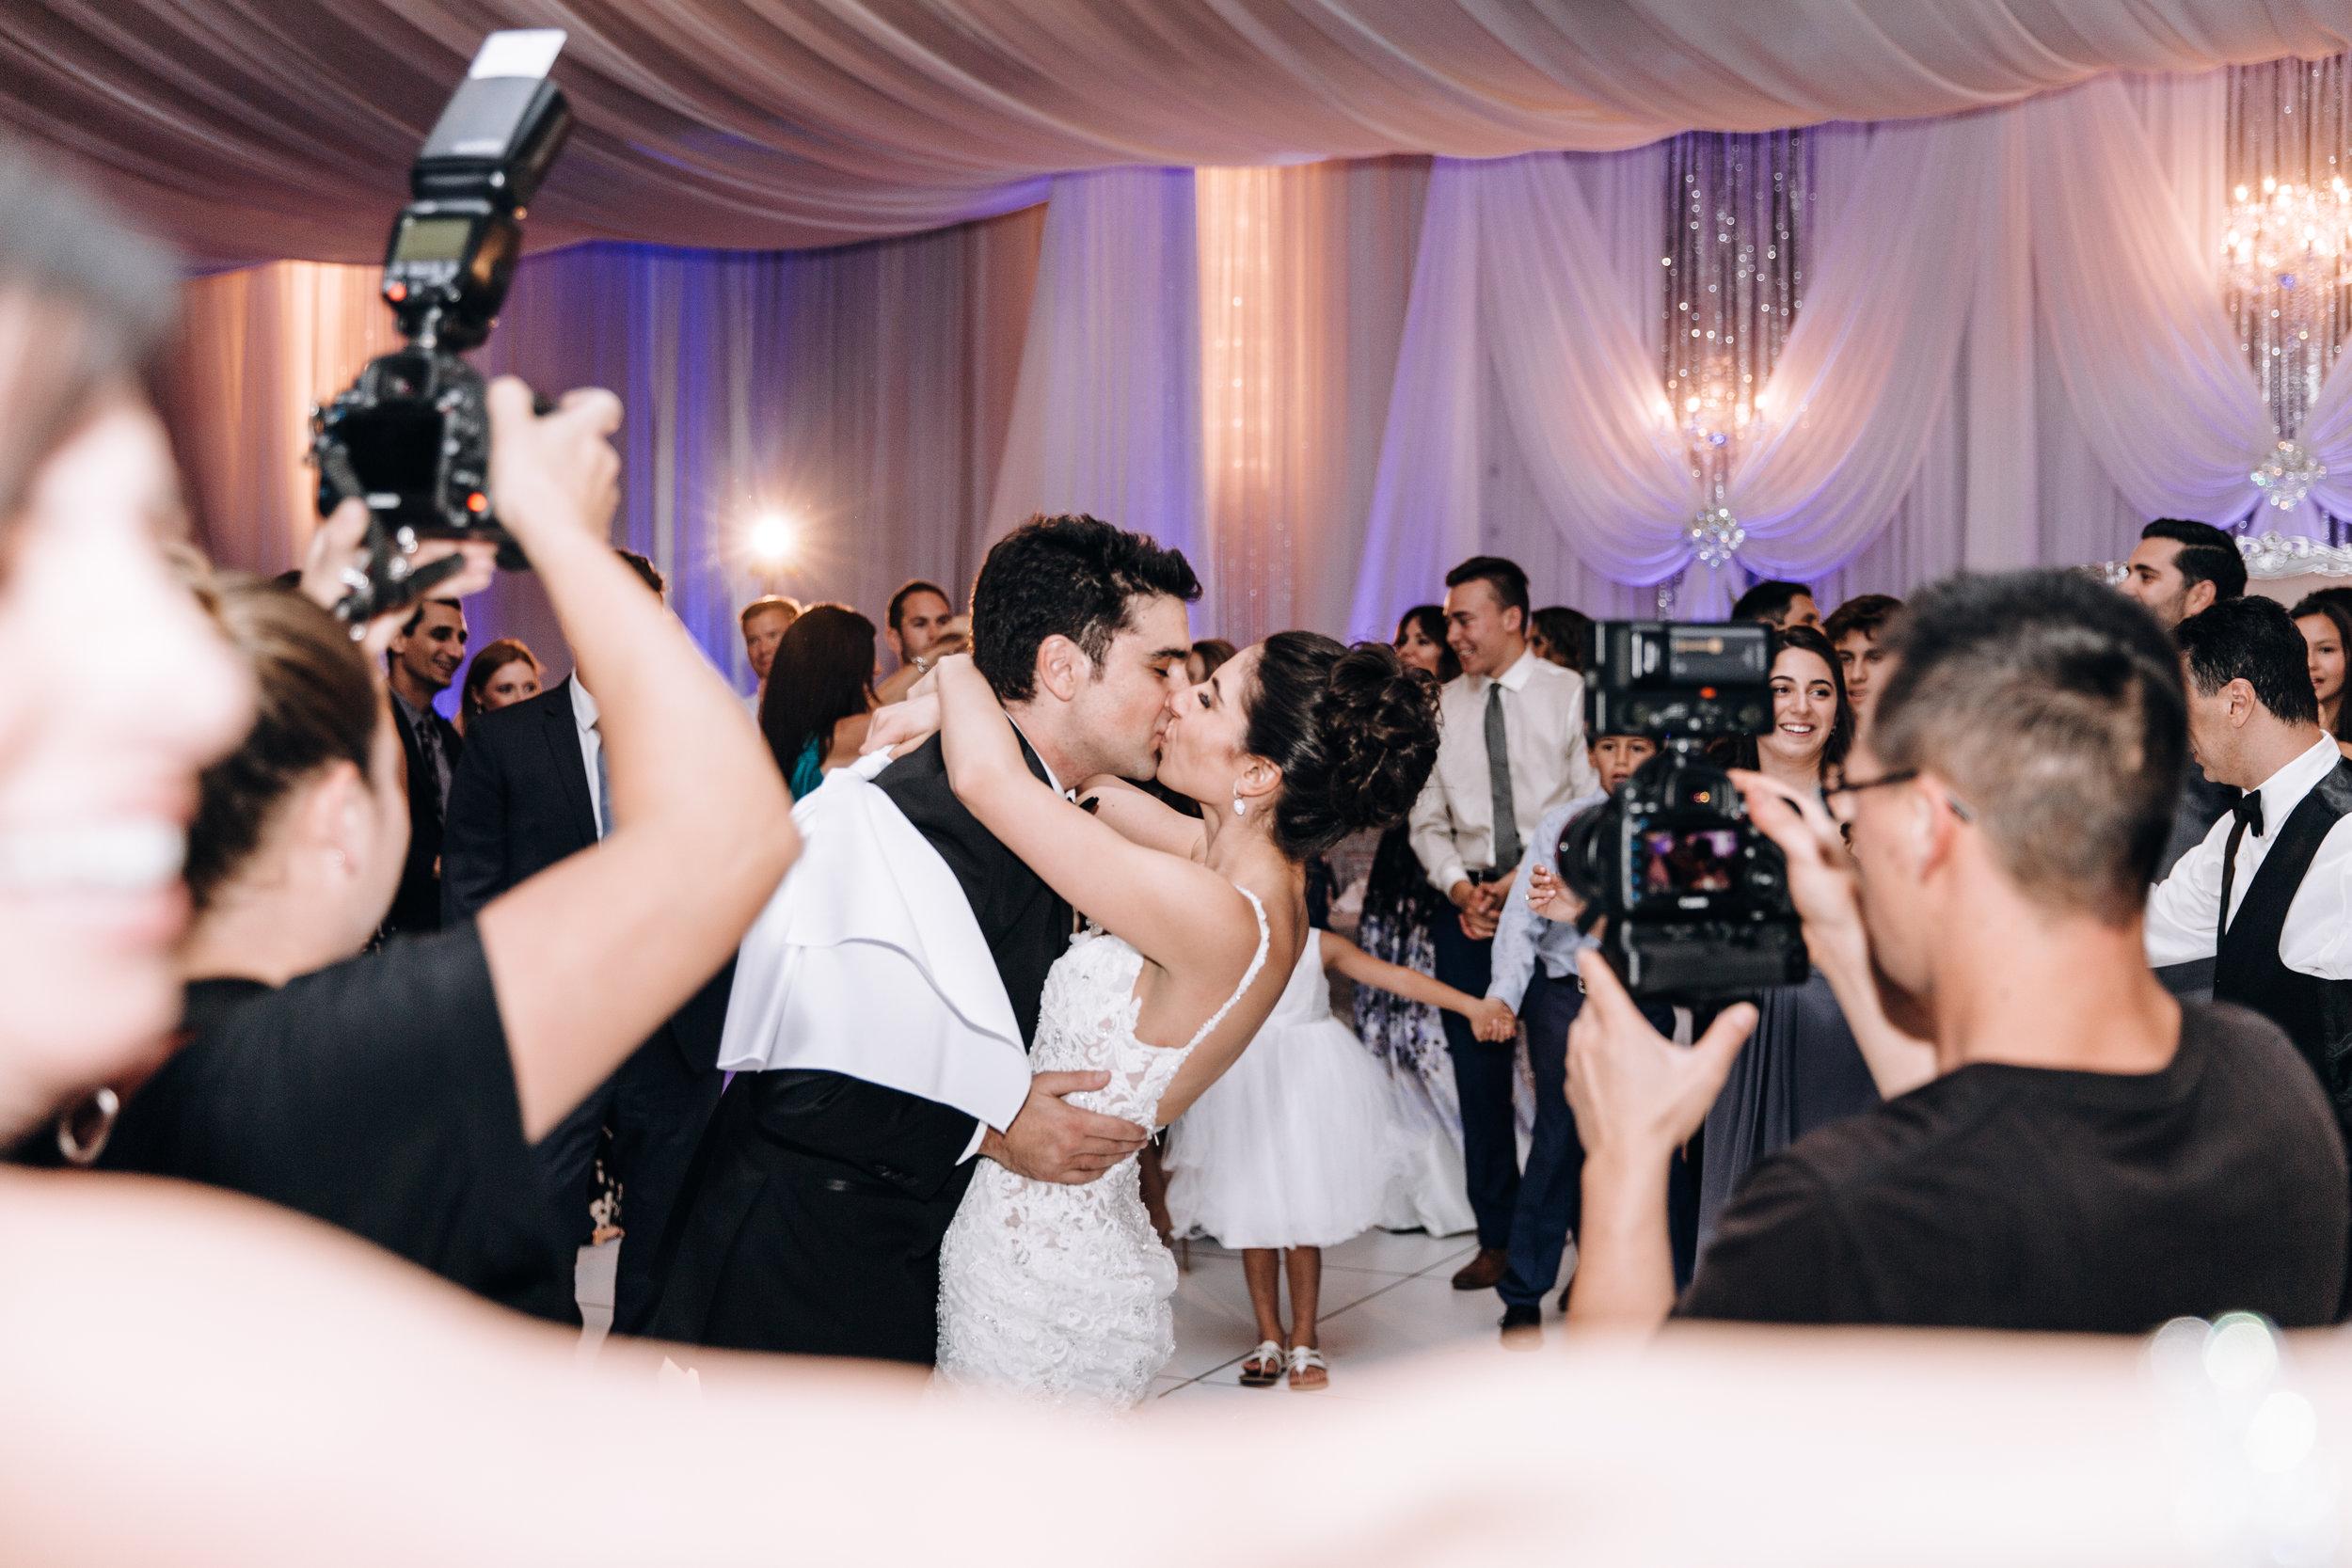 KaraNixonWeddings-GreekOrthodox-Oakland-Wedding-48.jpg